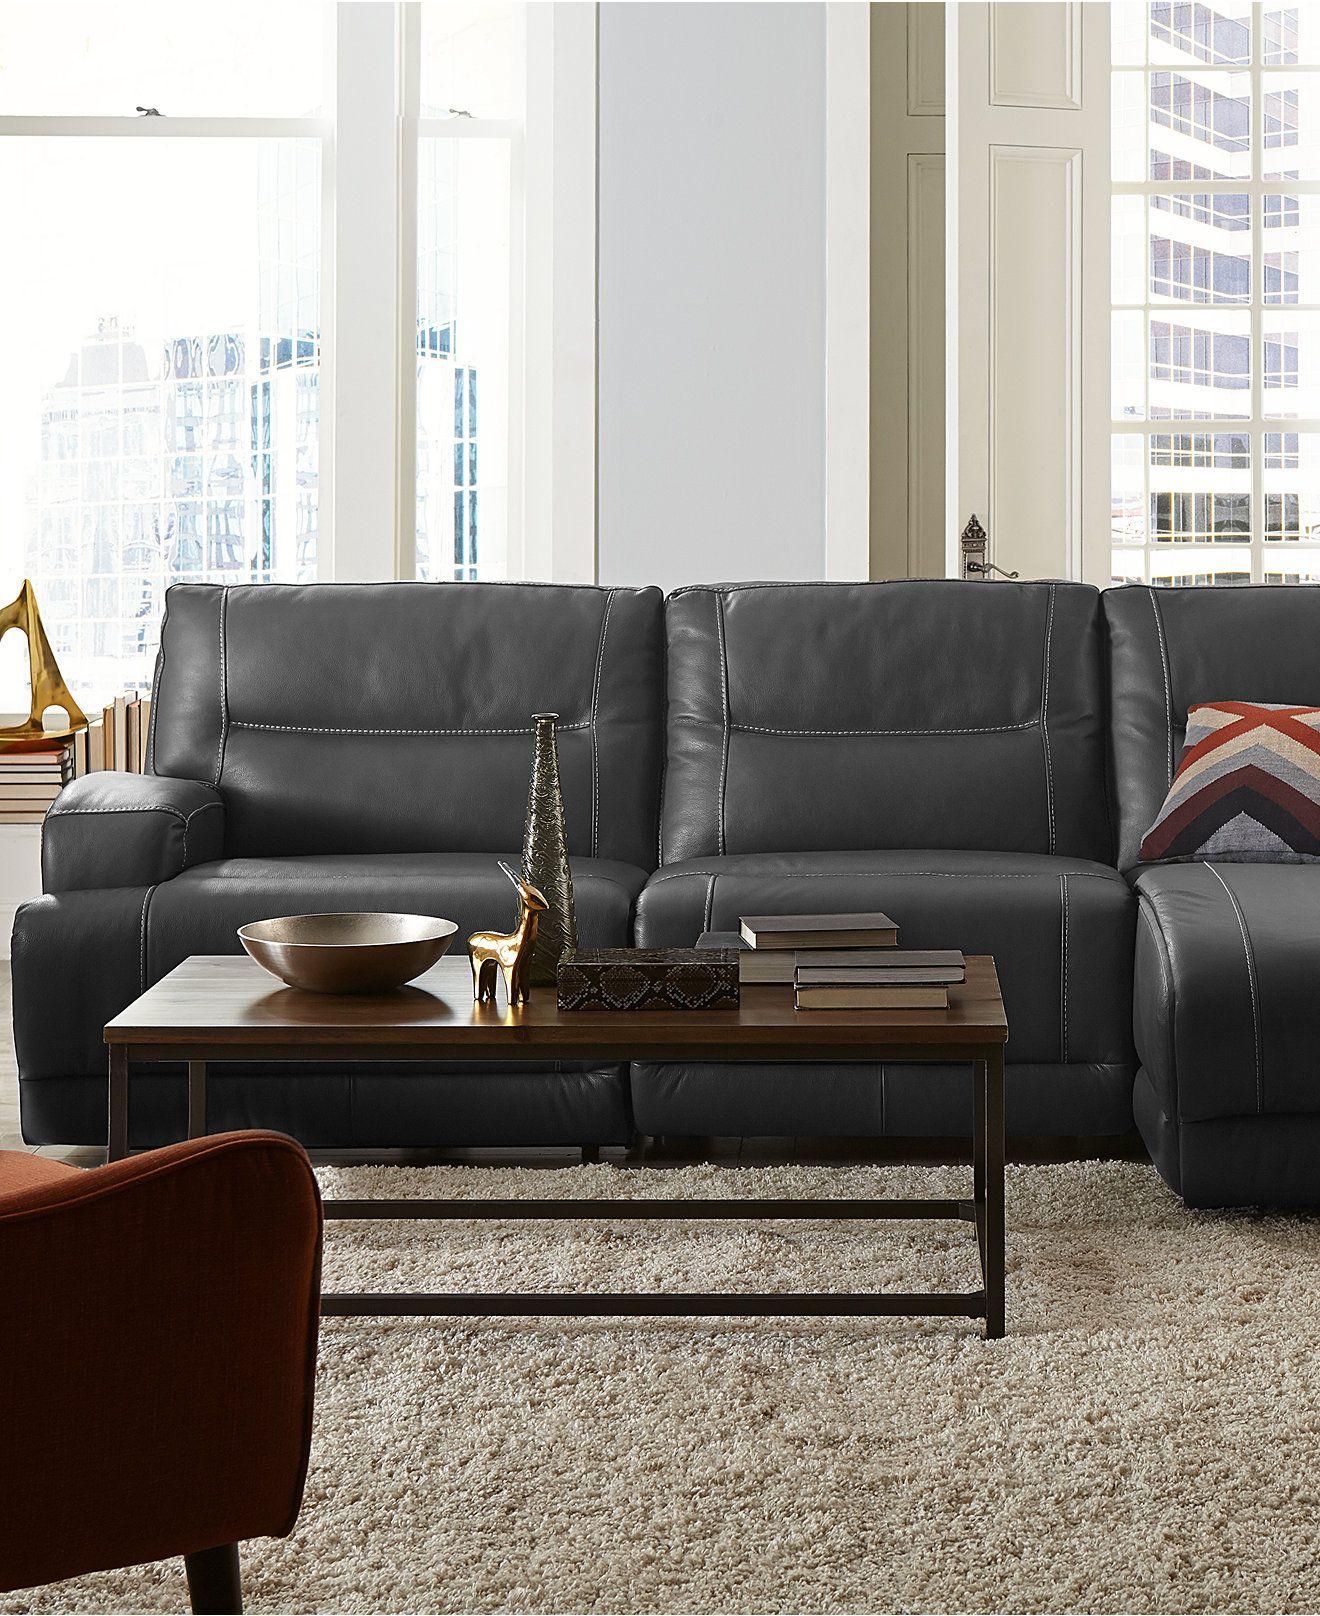 Sectional Sofa Living Room Furniture